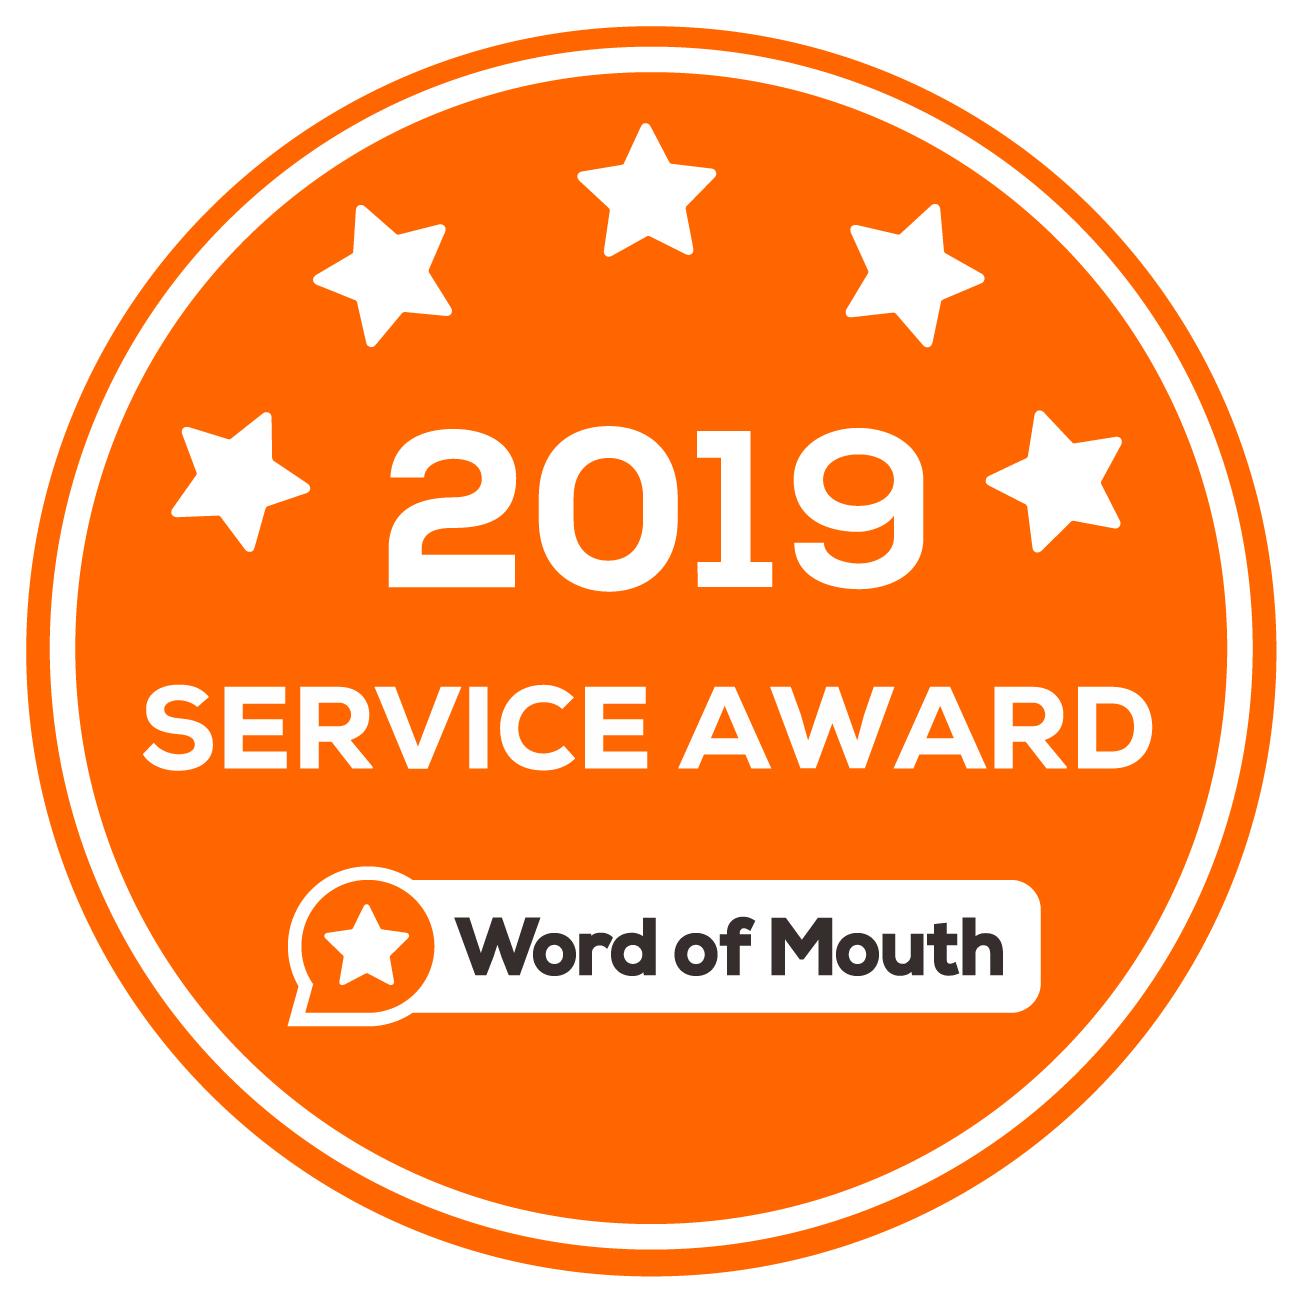 WOMO 2019 Service Award